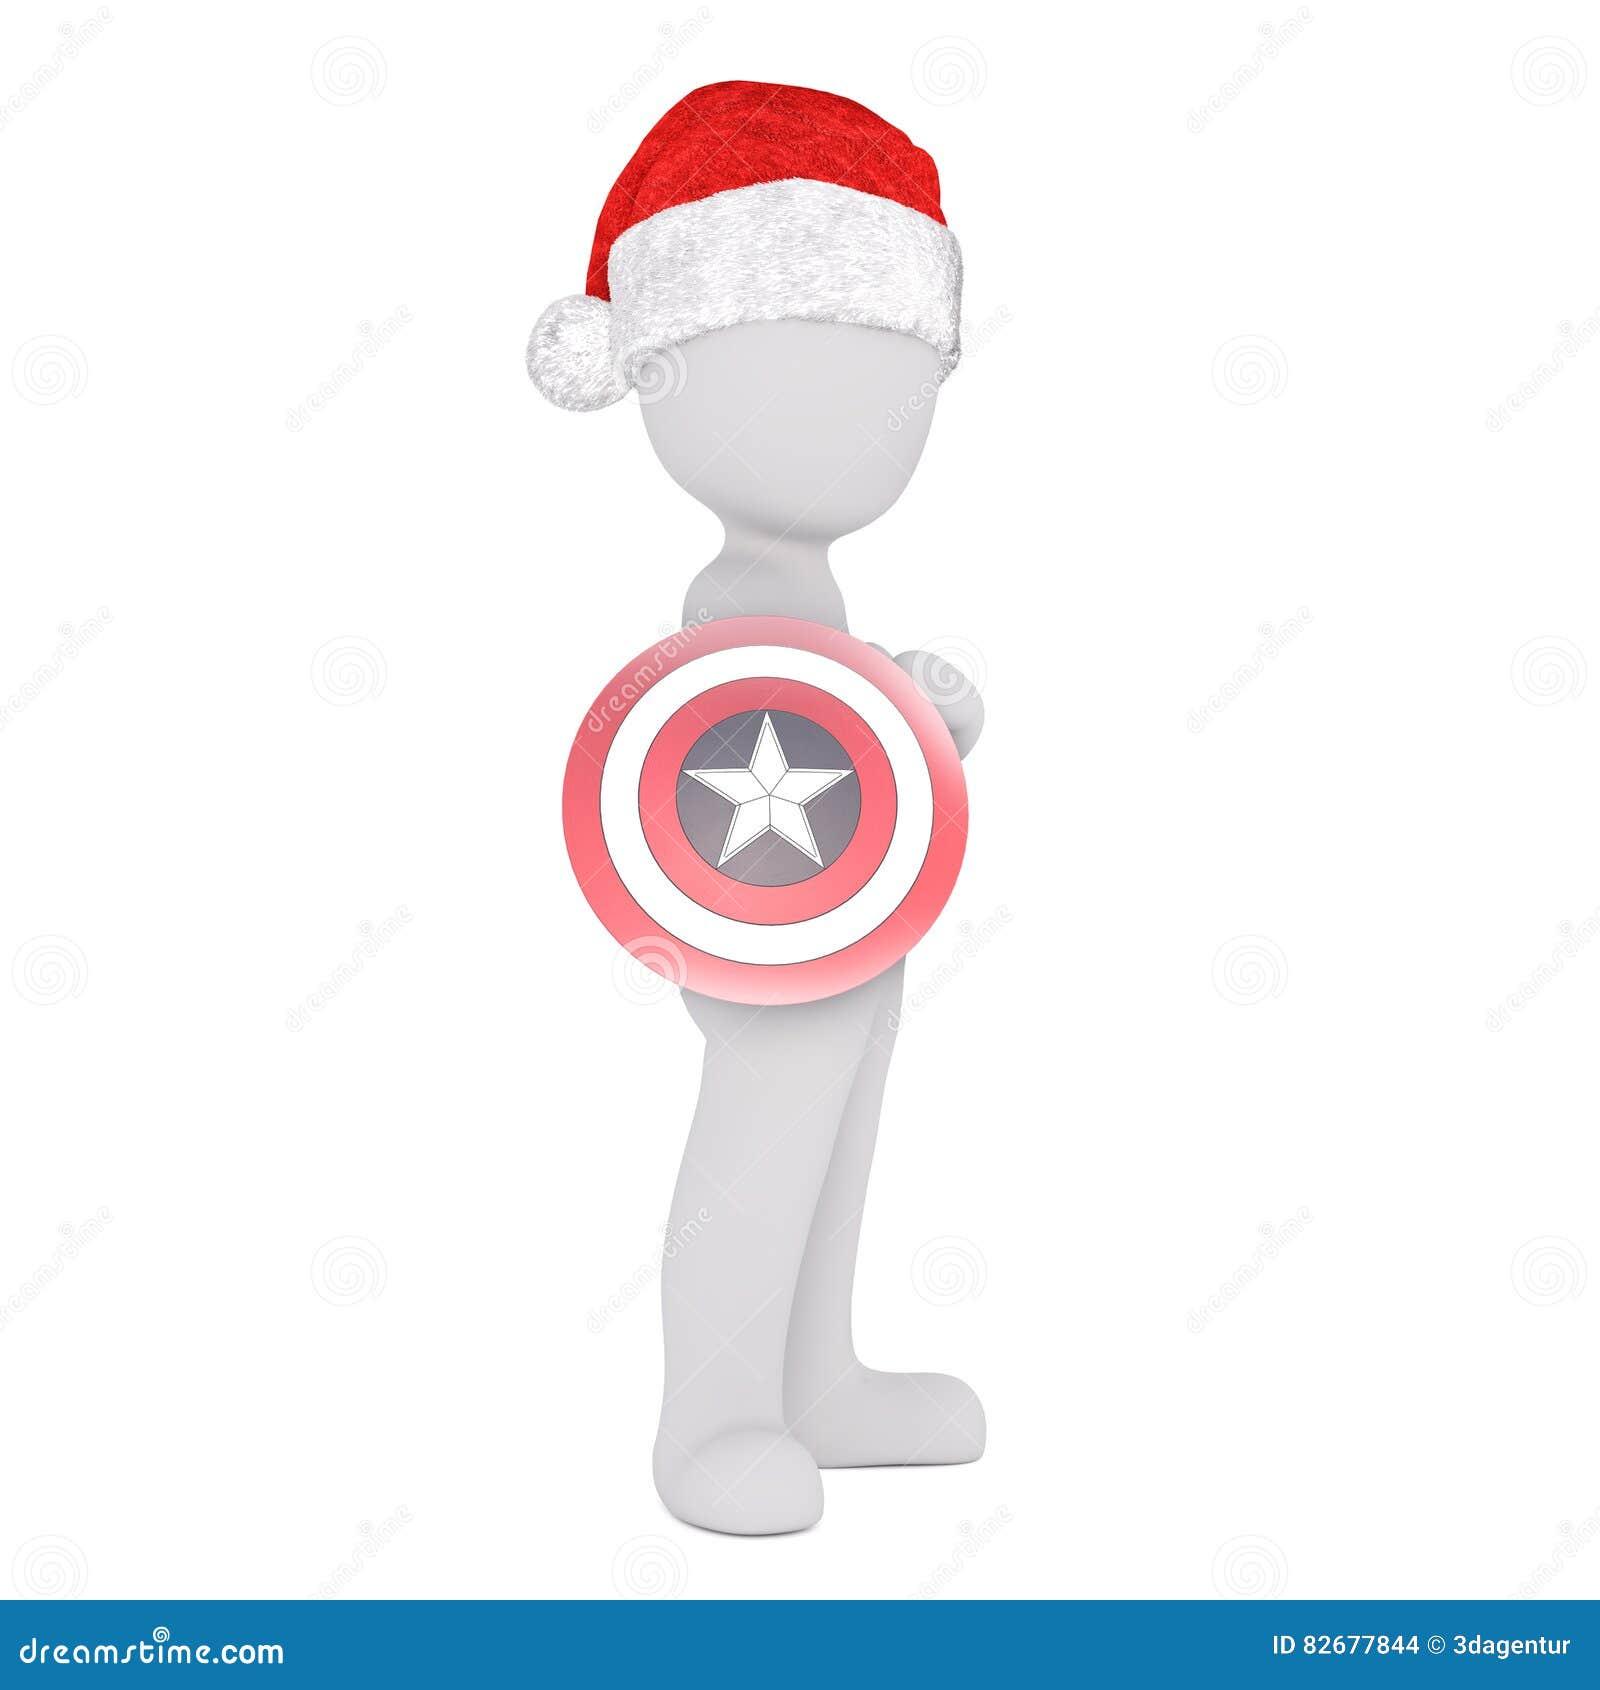 cdfe6f16a0ac6 Full body 3d toon in Santa hat holding superhero target on white. More  similar stock illustrations